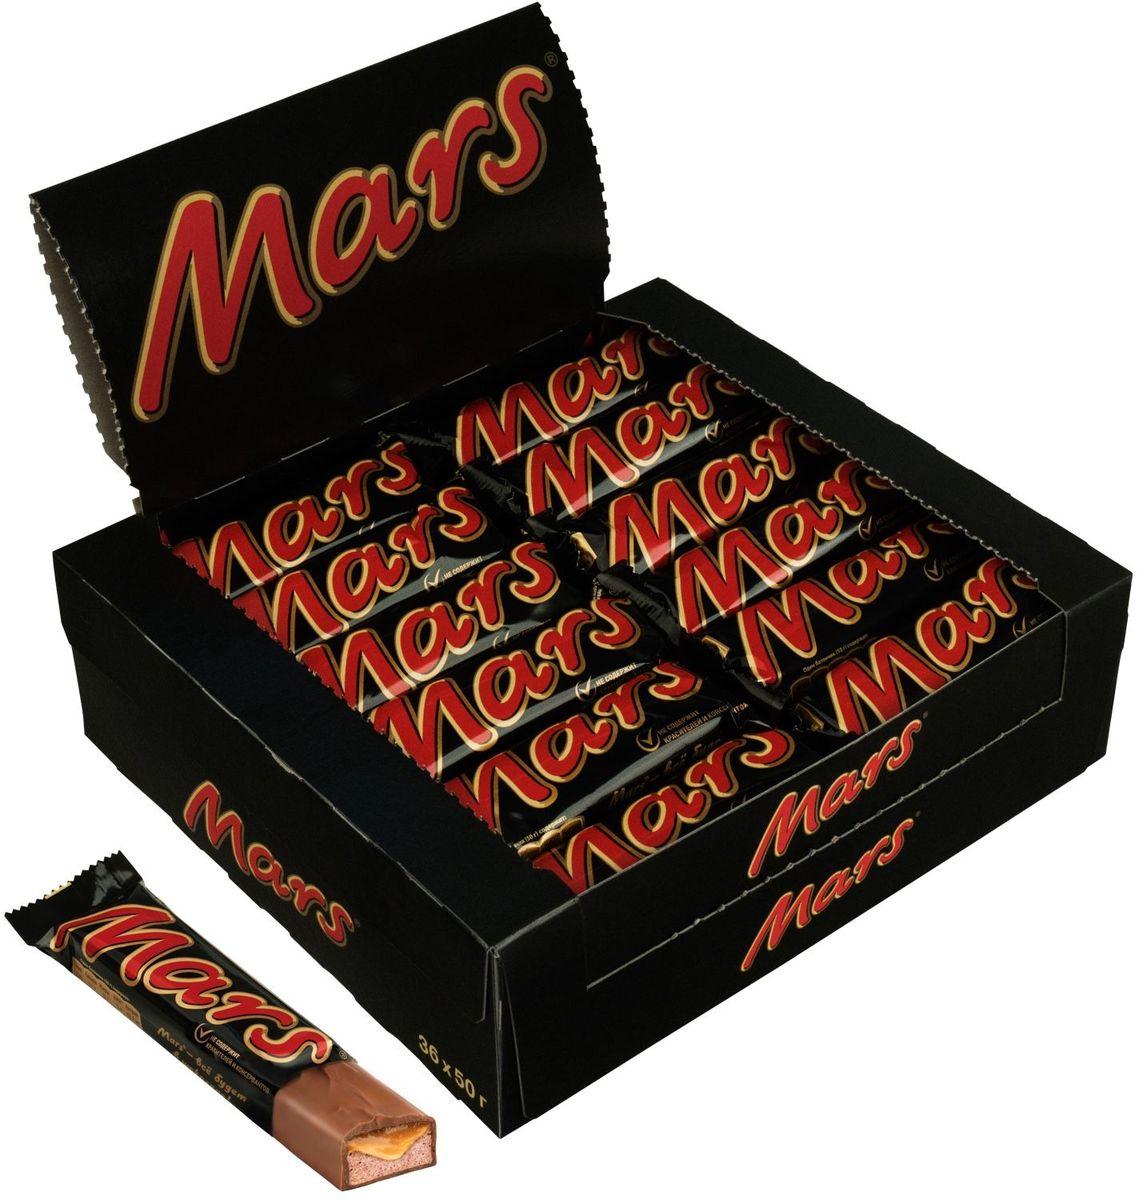 Mars шоколадный батончик, 36 шт по 50 г батончик champions high protein bar 40 г шоубокс 16 шт академия т